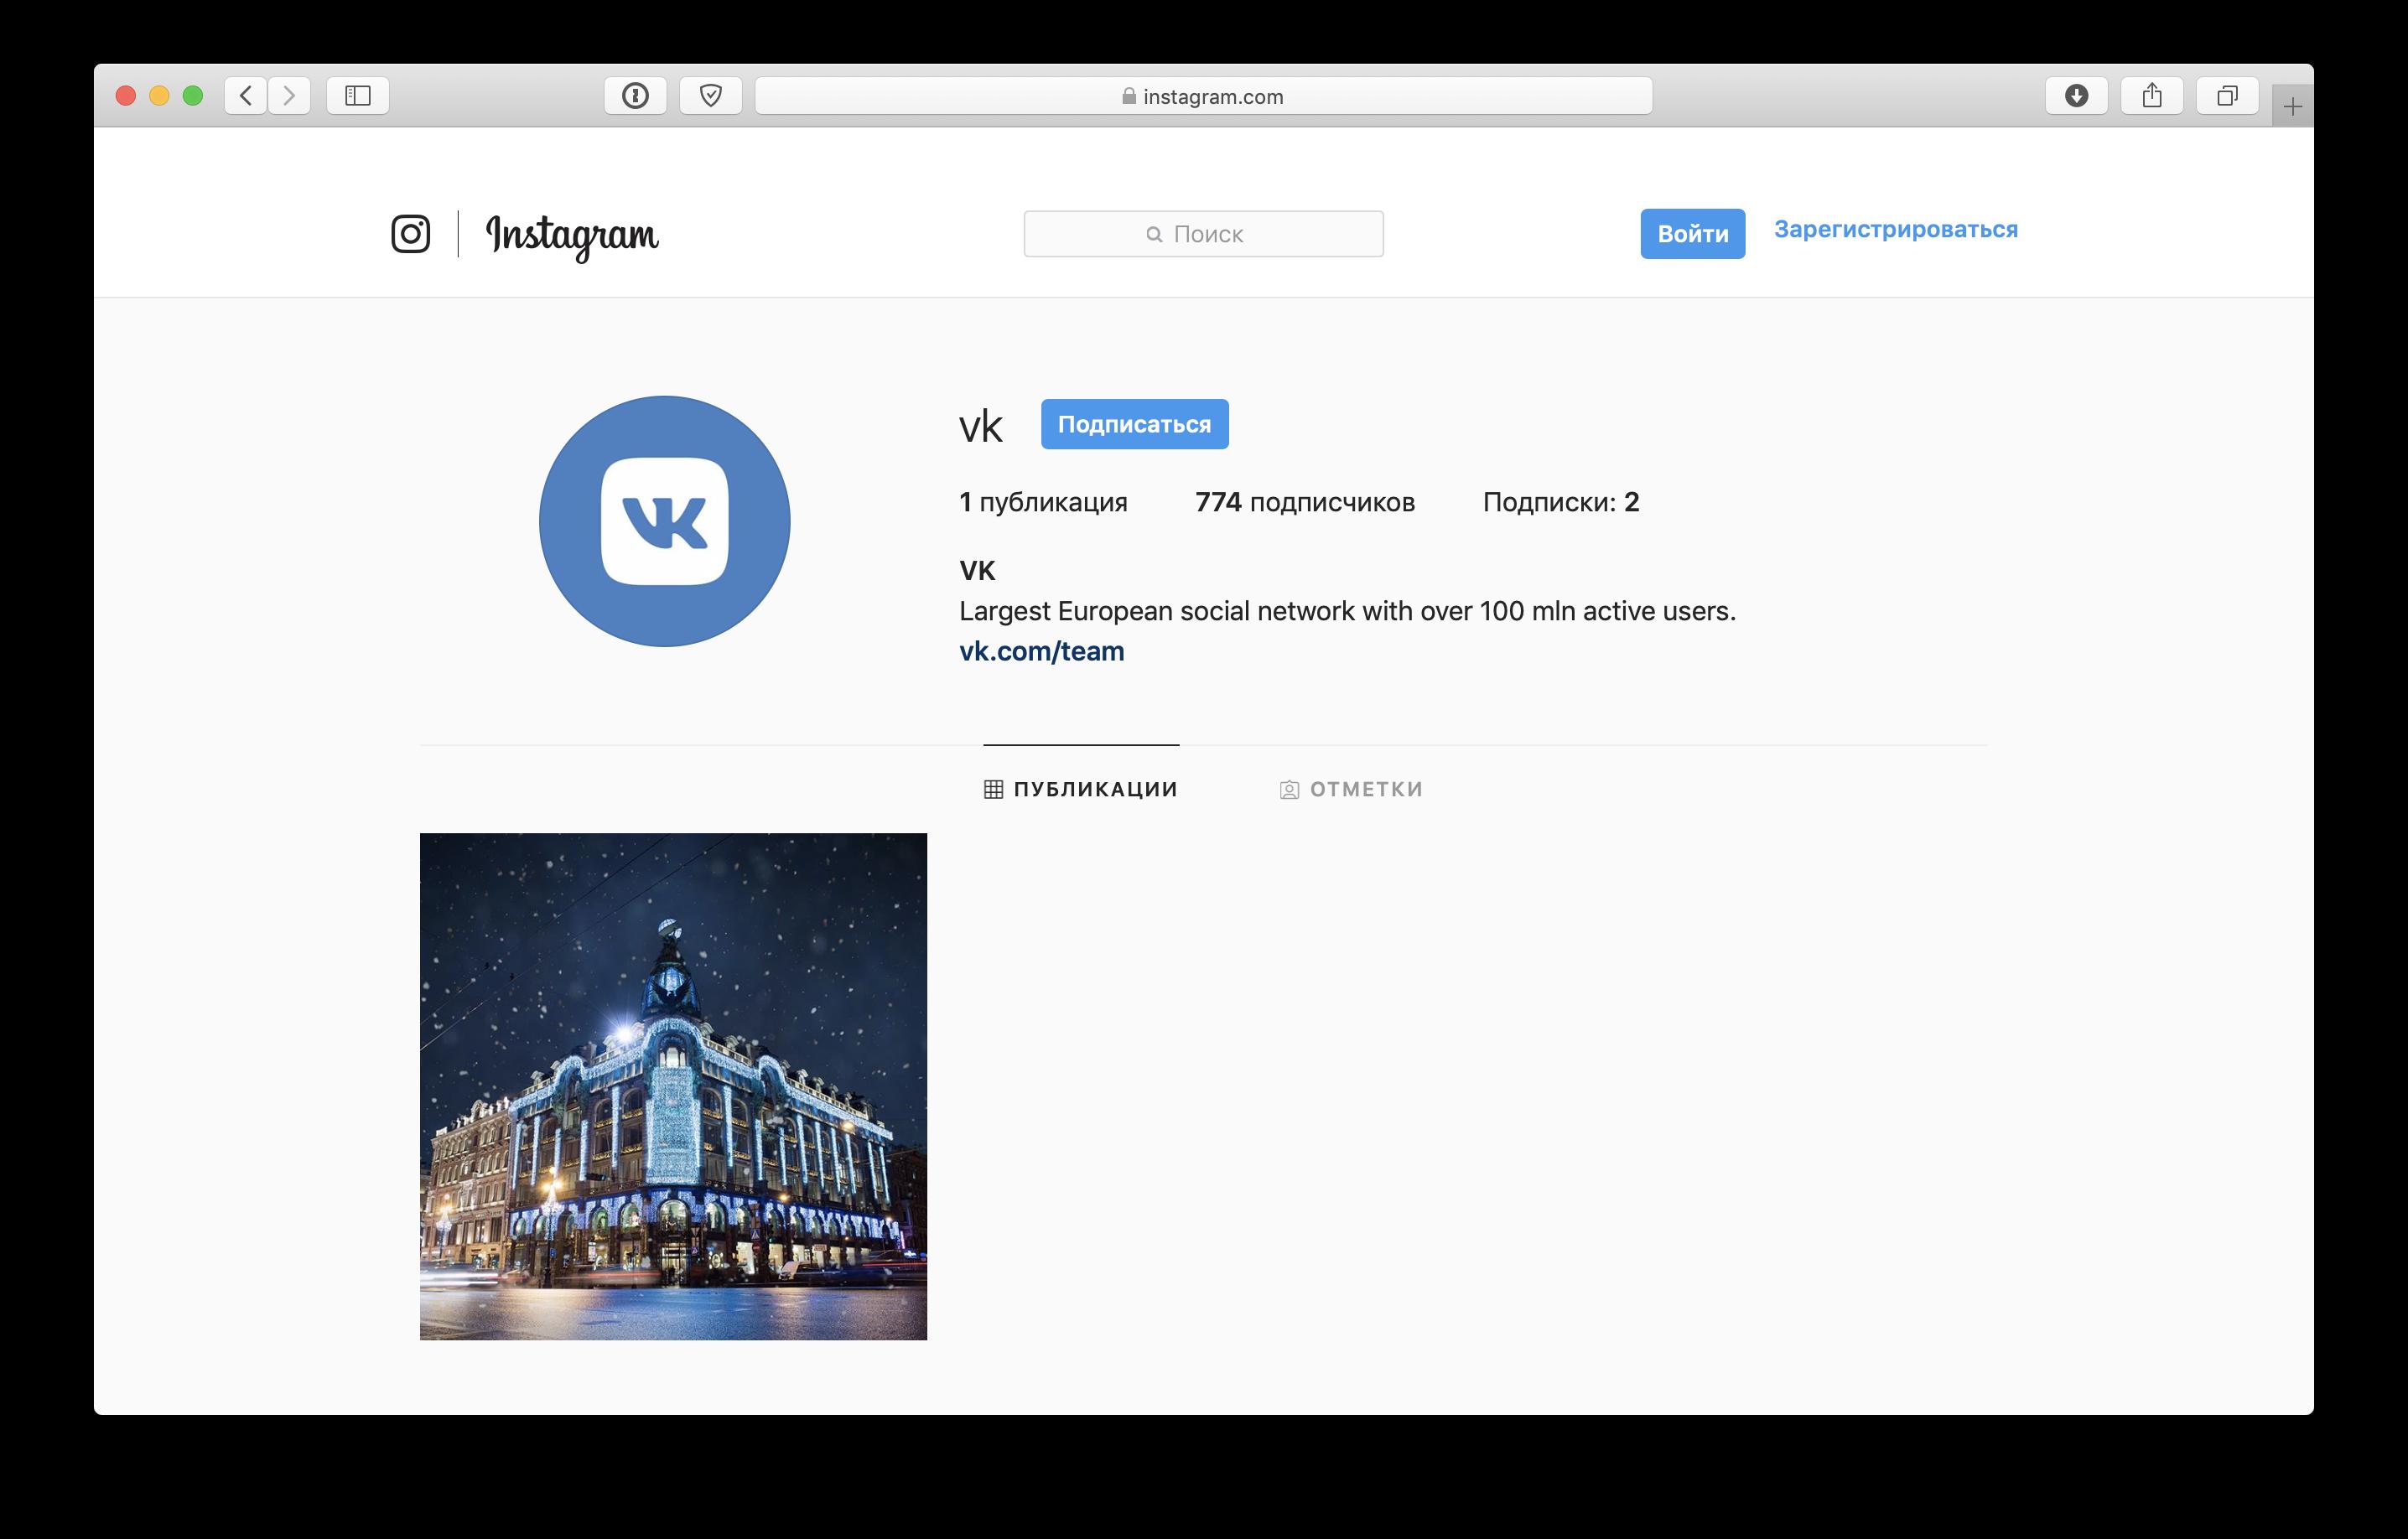 """VKontakte"" registered in Instagram"